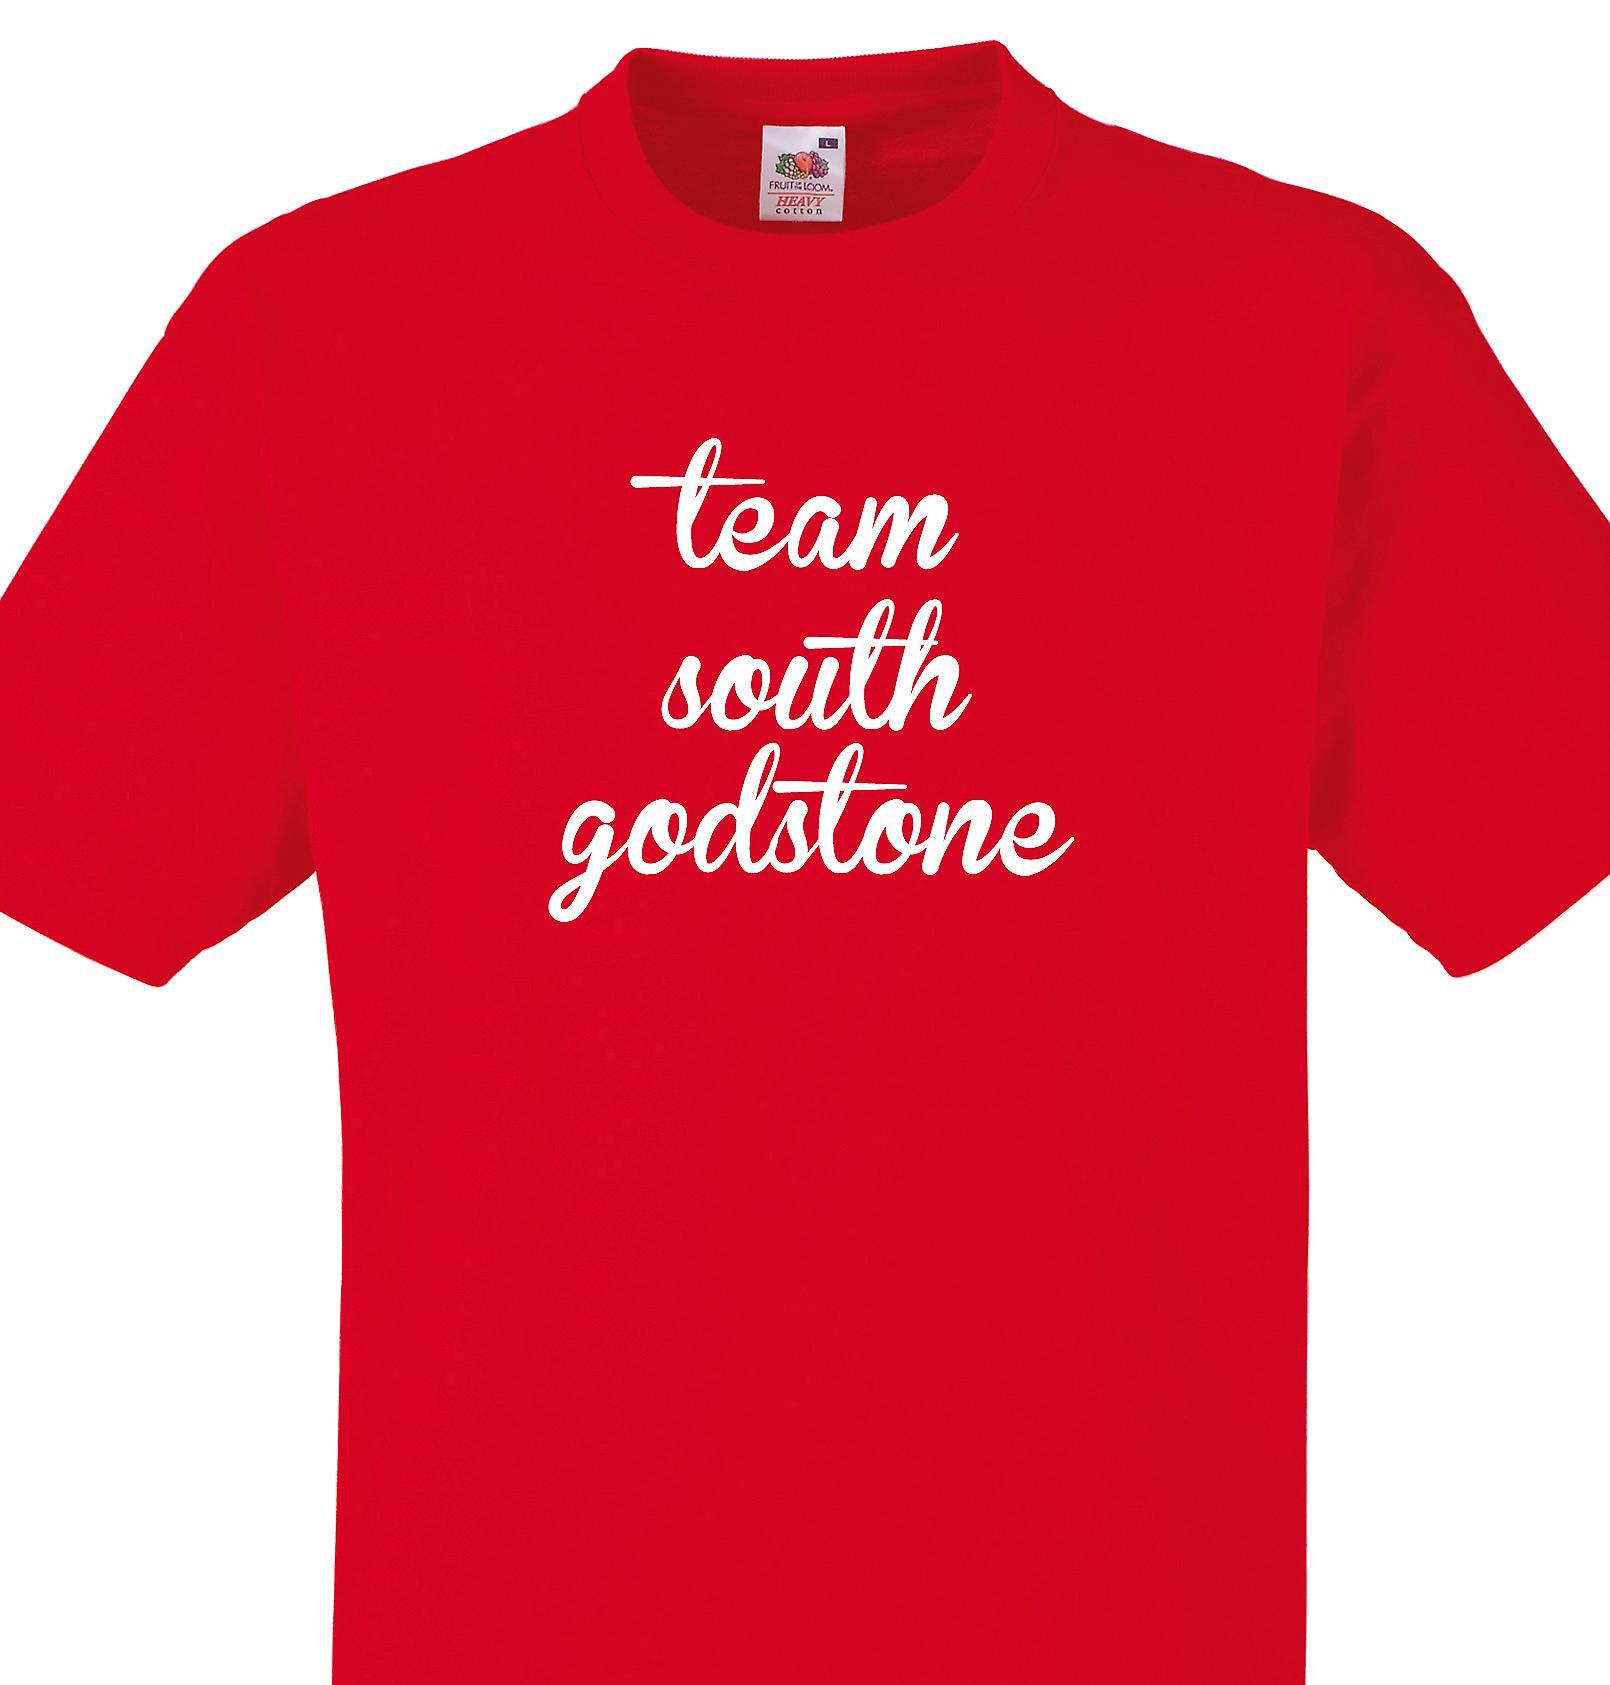 Team South godstone Red T shirt